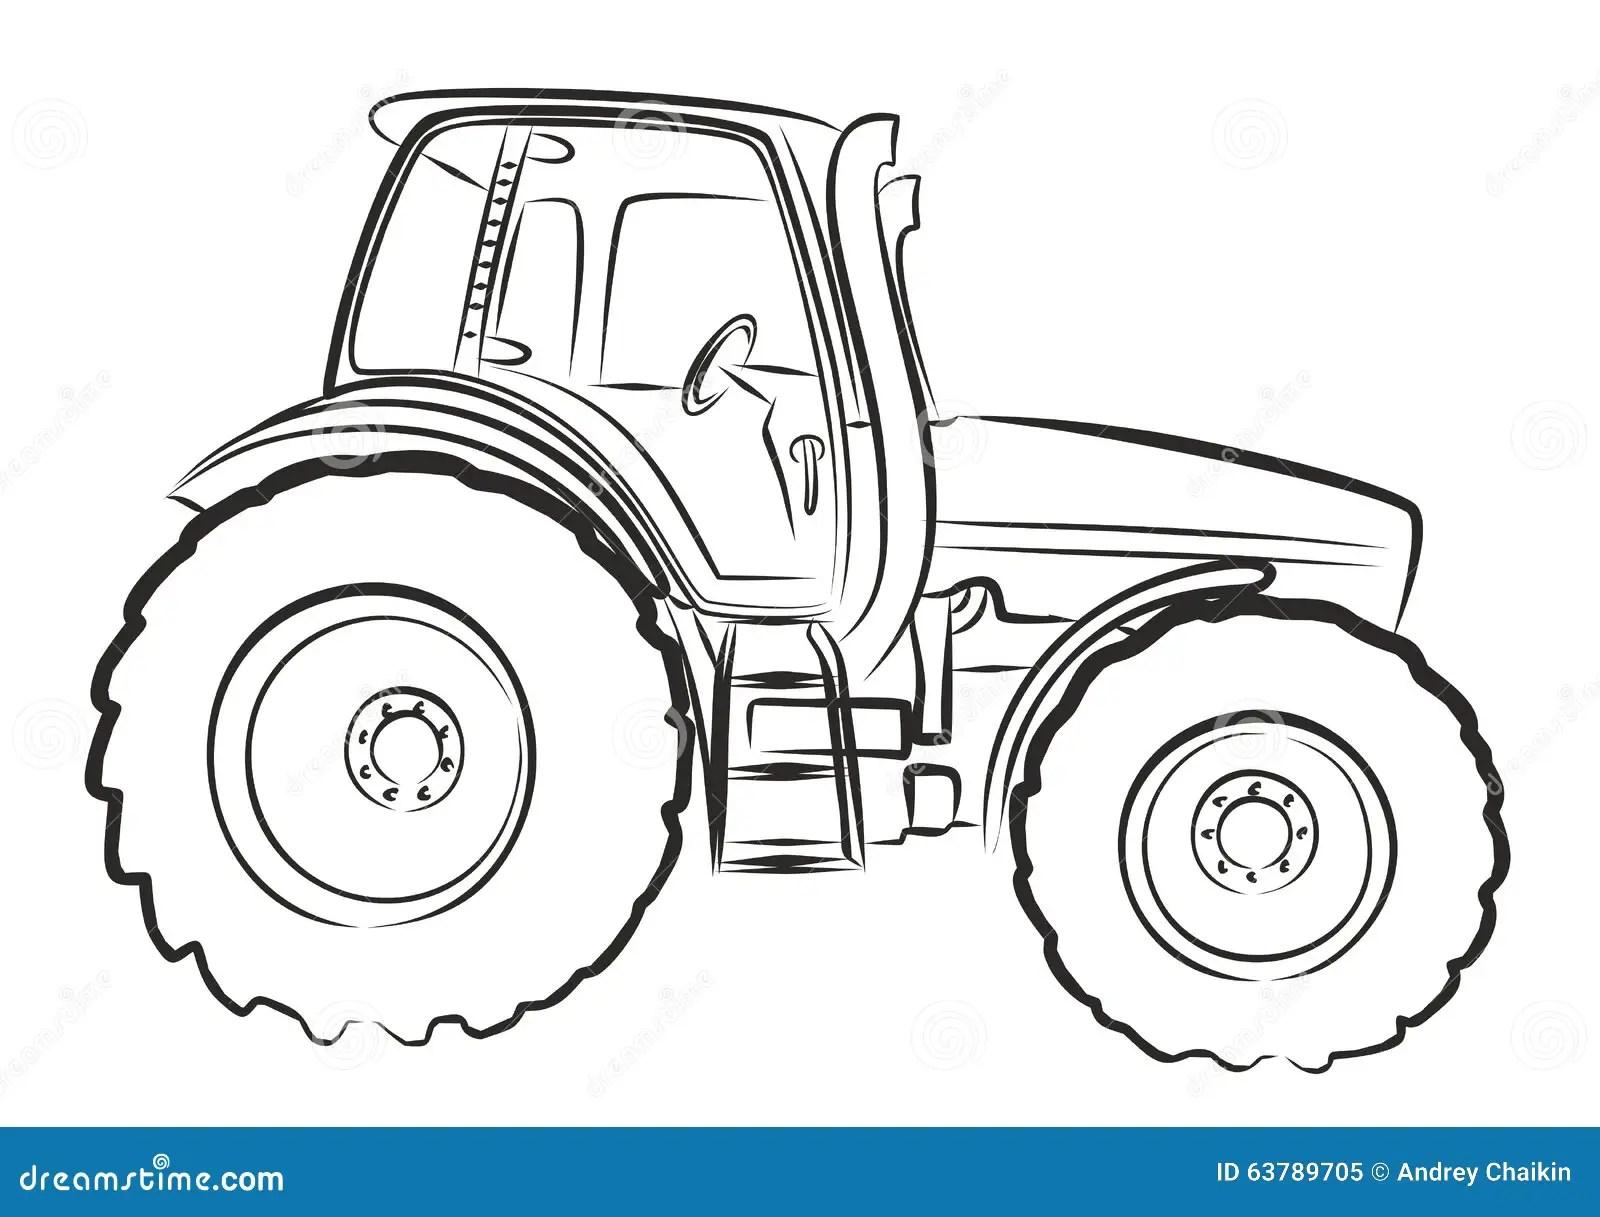 Tractor Sketch Stock Vector Illustration Of Rural